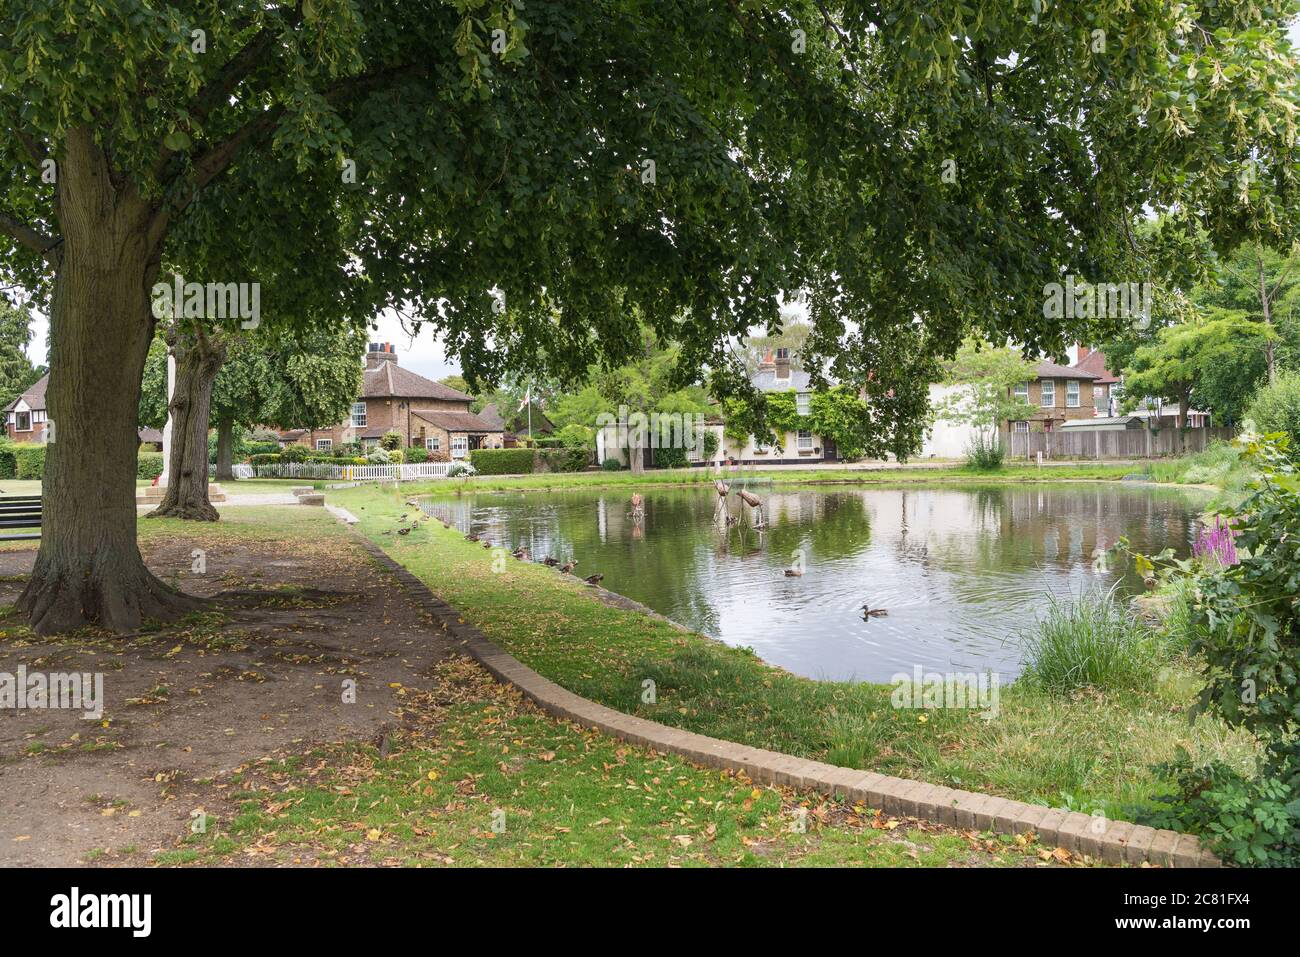 The duckpond on Centenary Field, Harefield village green,Middlesex, England, UK Stock Photo